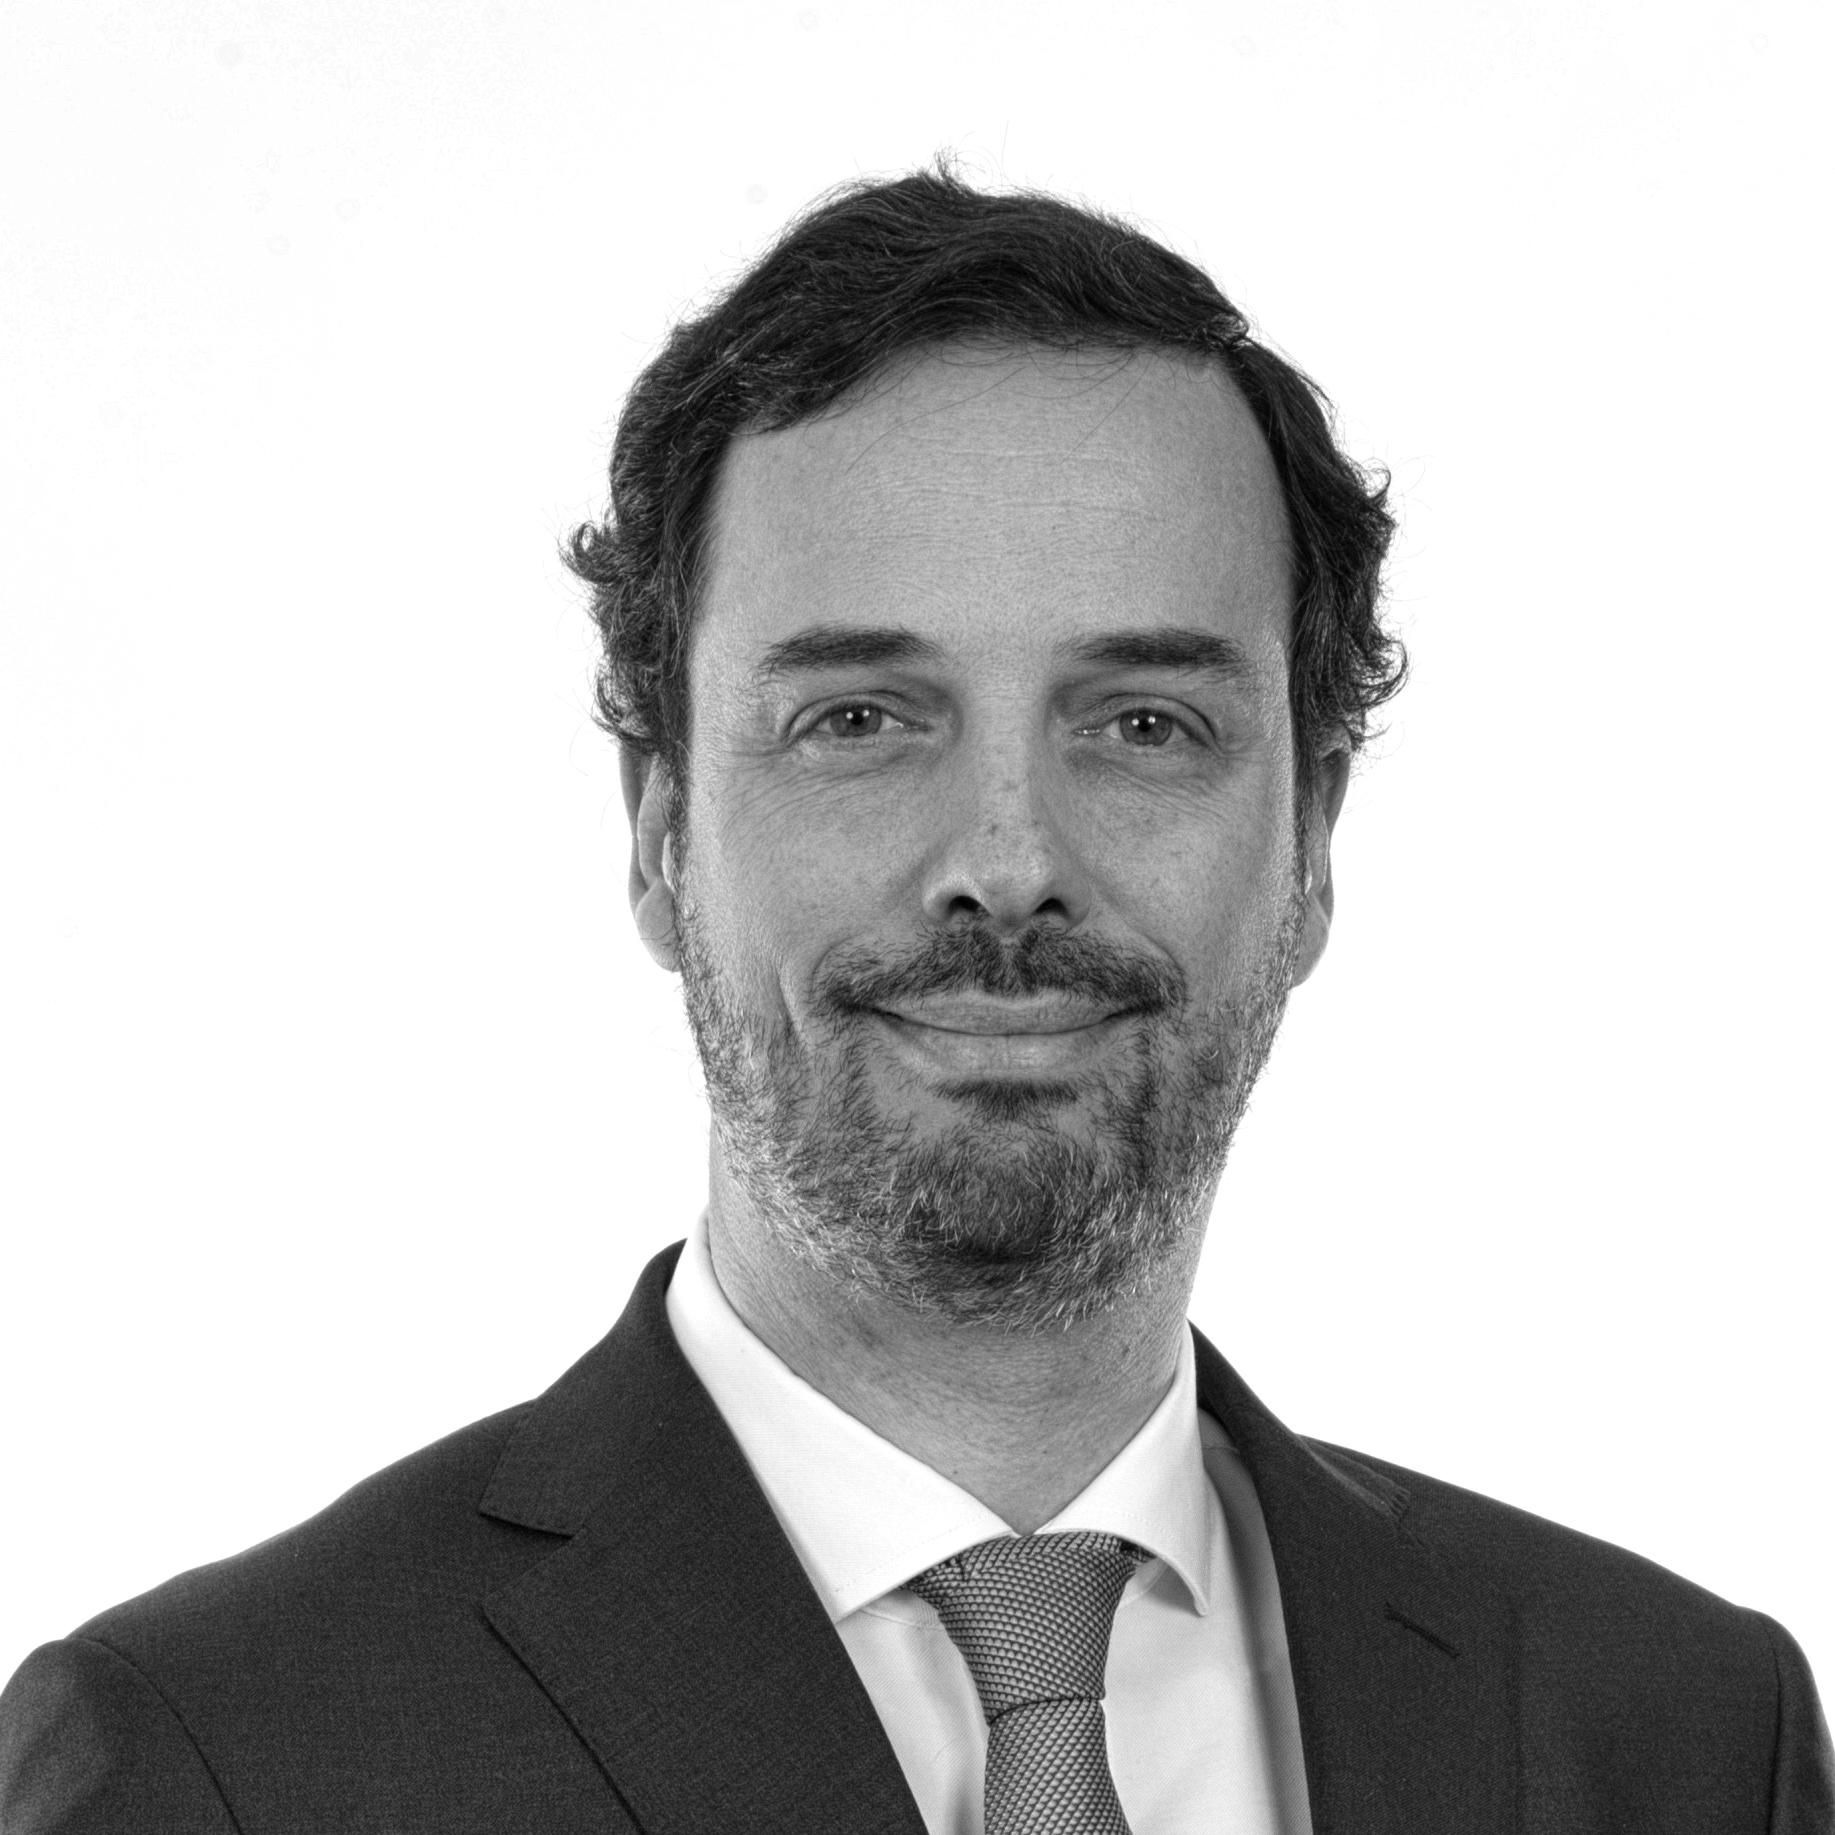 Fernando Veiga Gomes